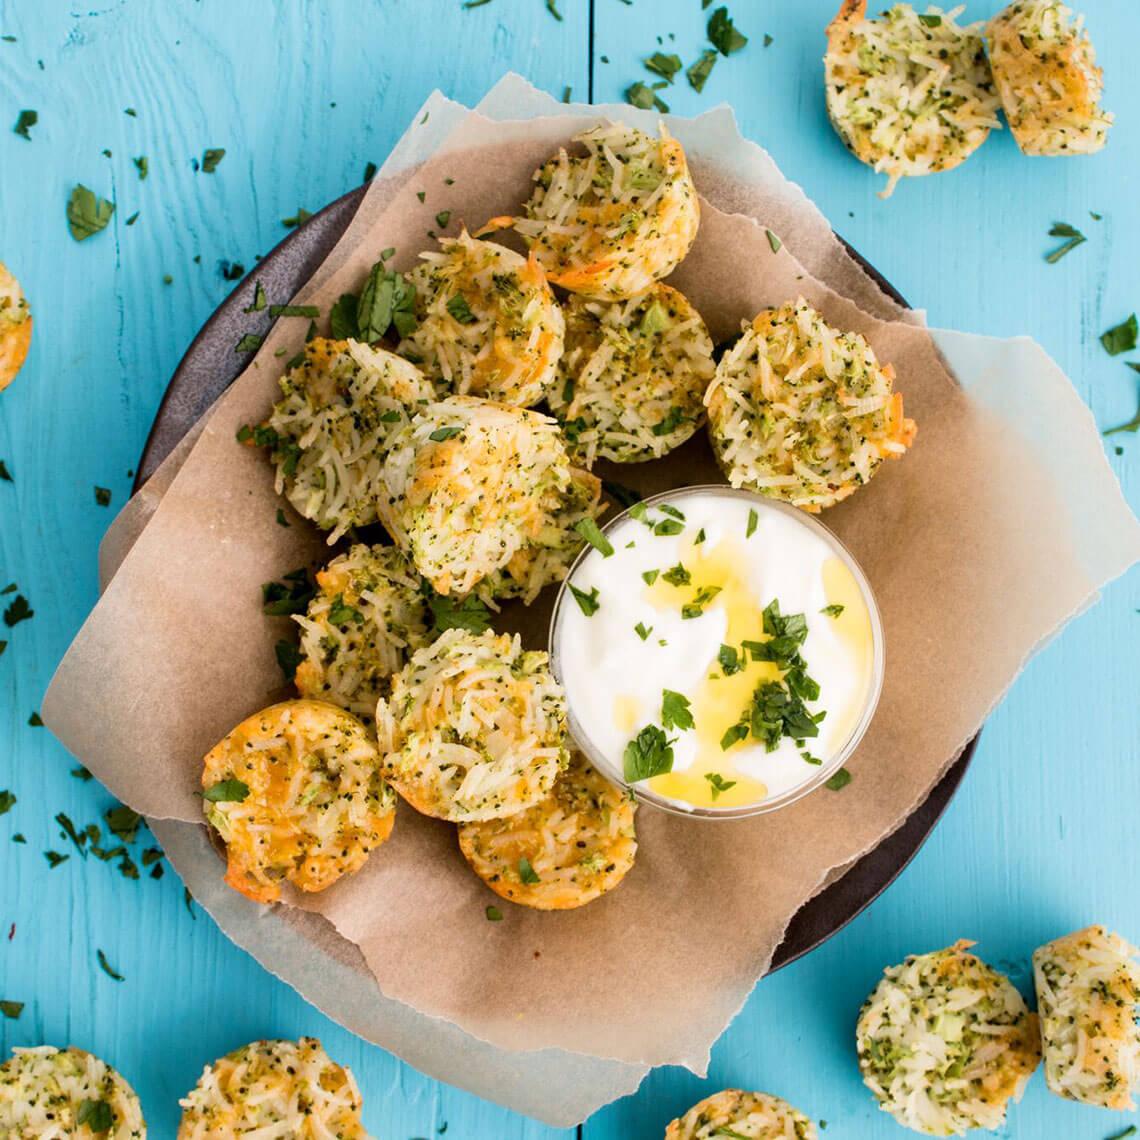 Rice and Cheddar Broccoli Bites